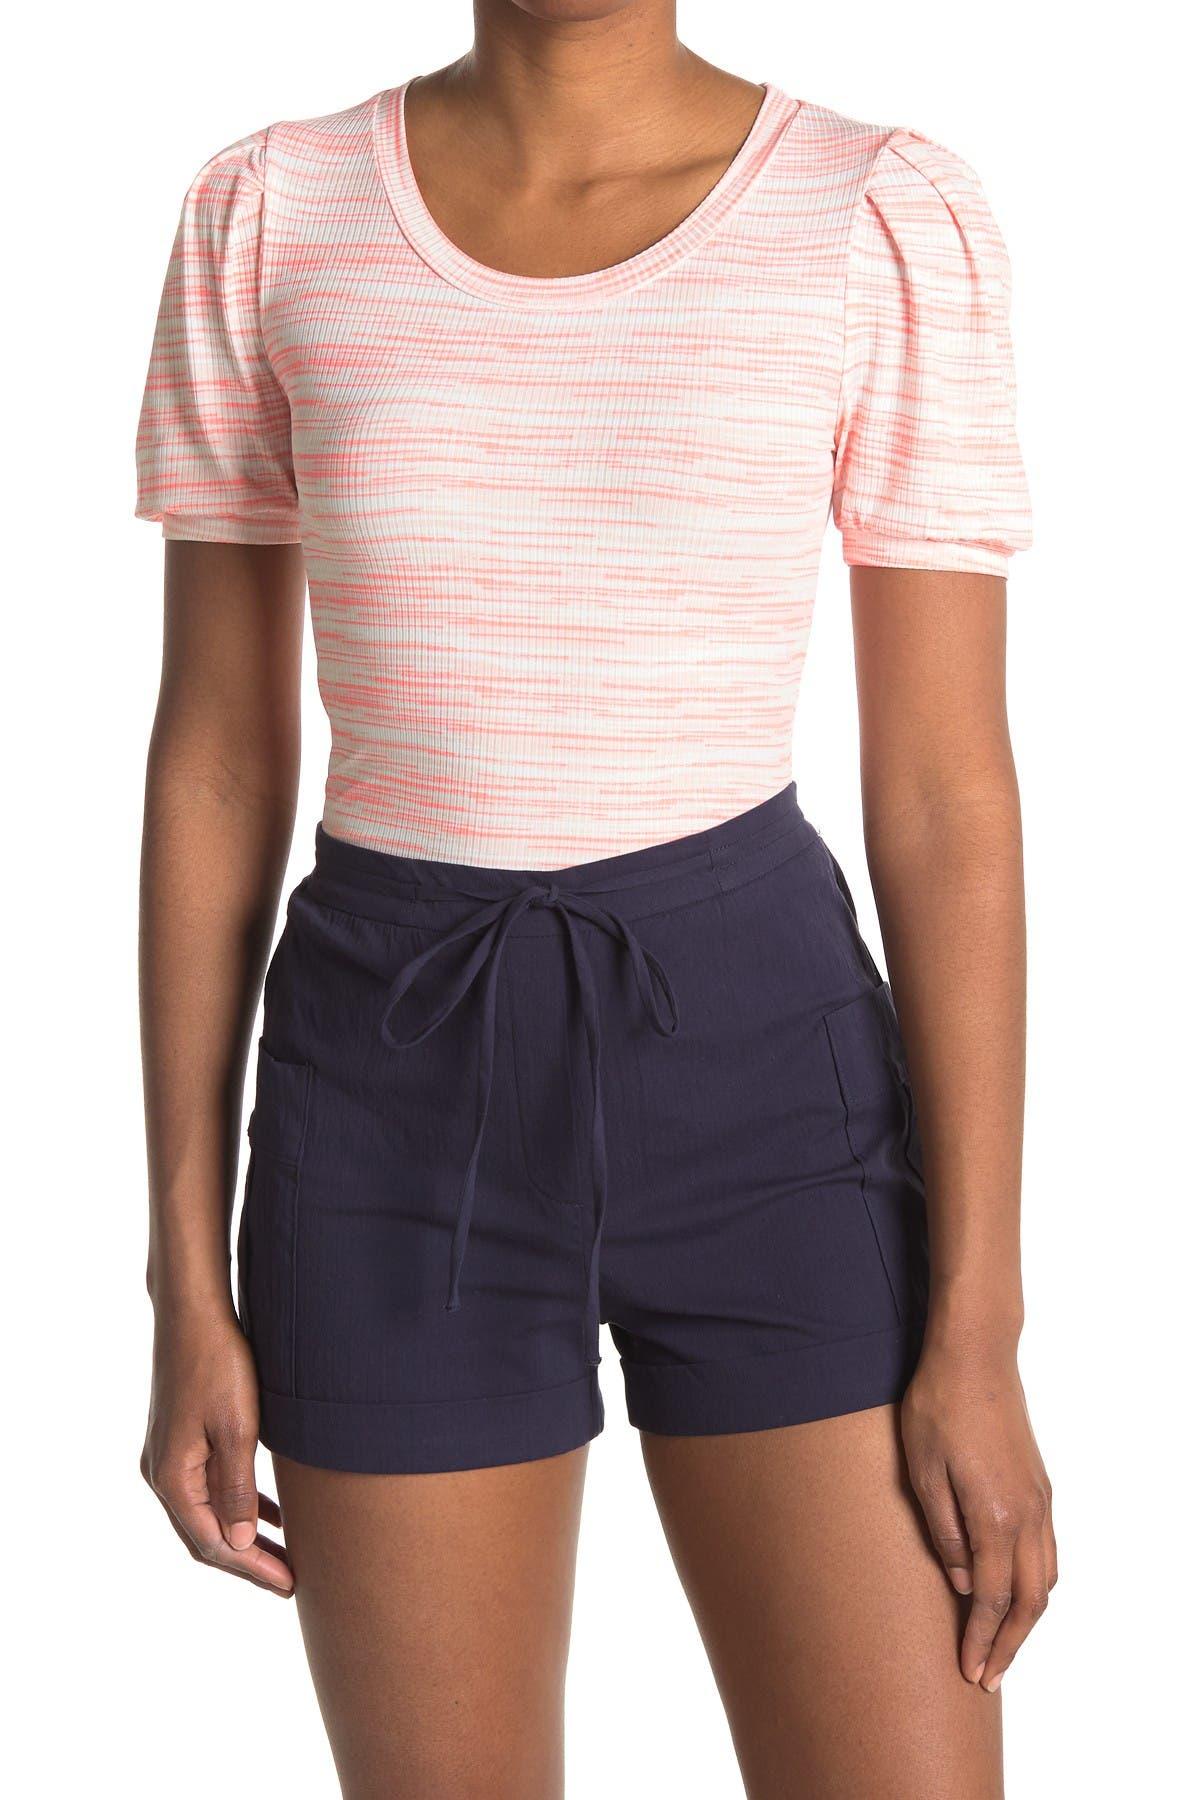 Image of GOOD LUCK GEM Multi Stripe Puff Sleeve Rib Knit Top